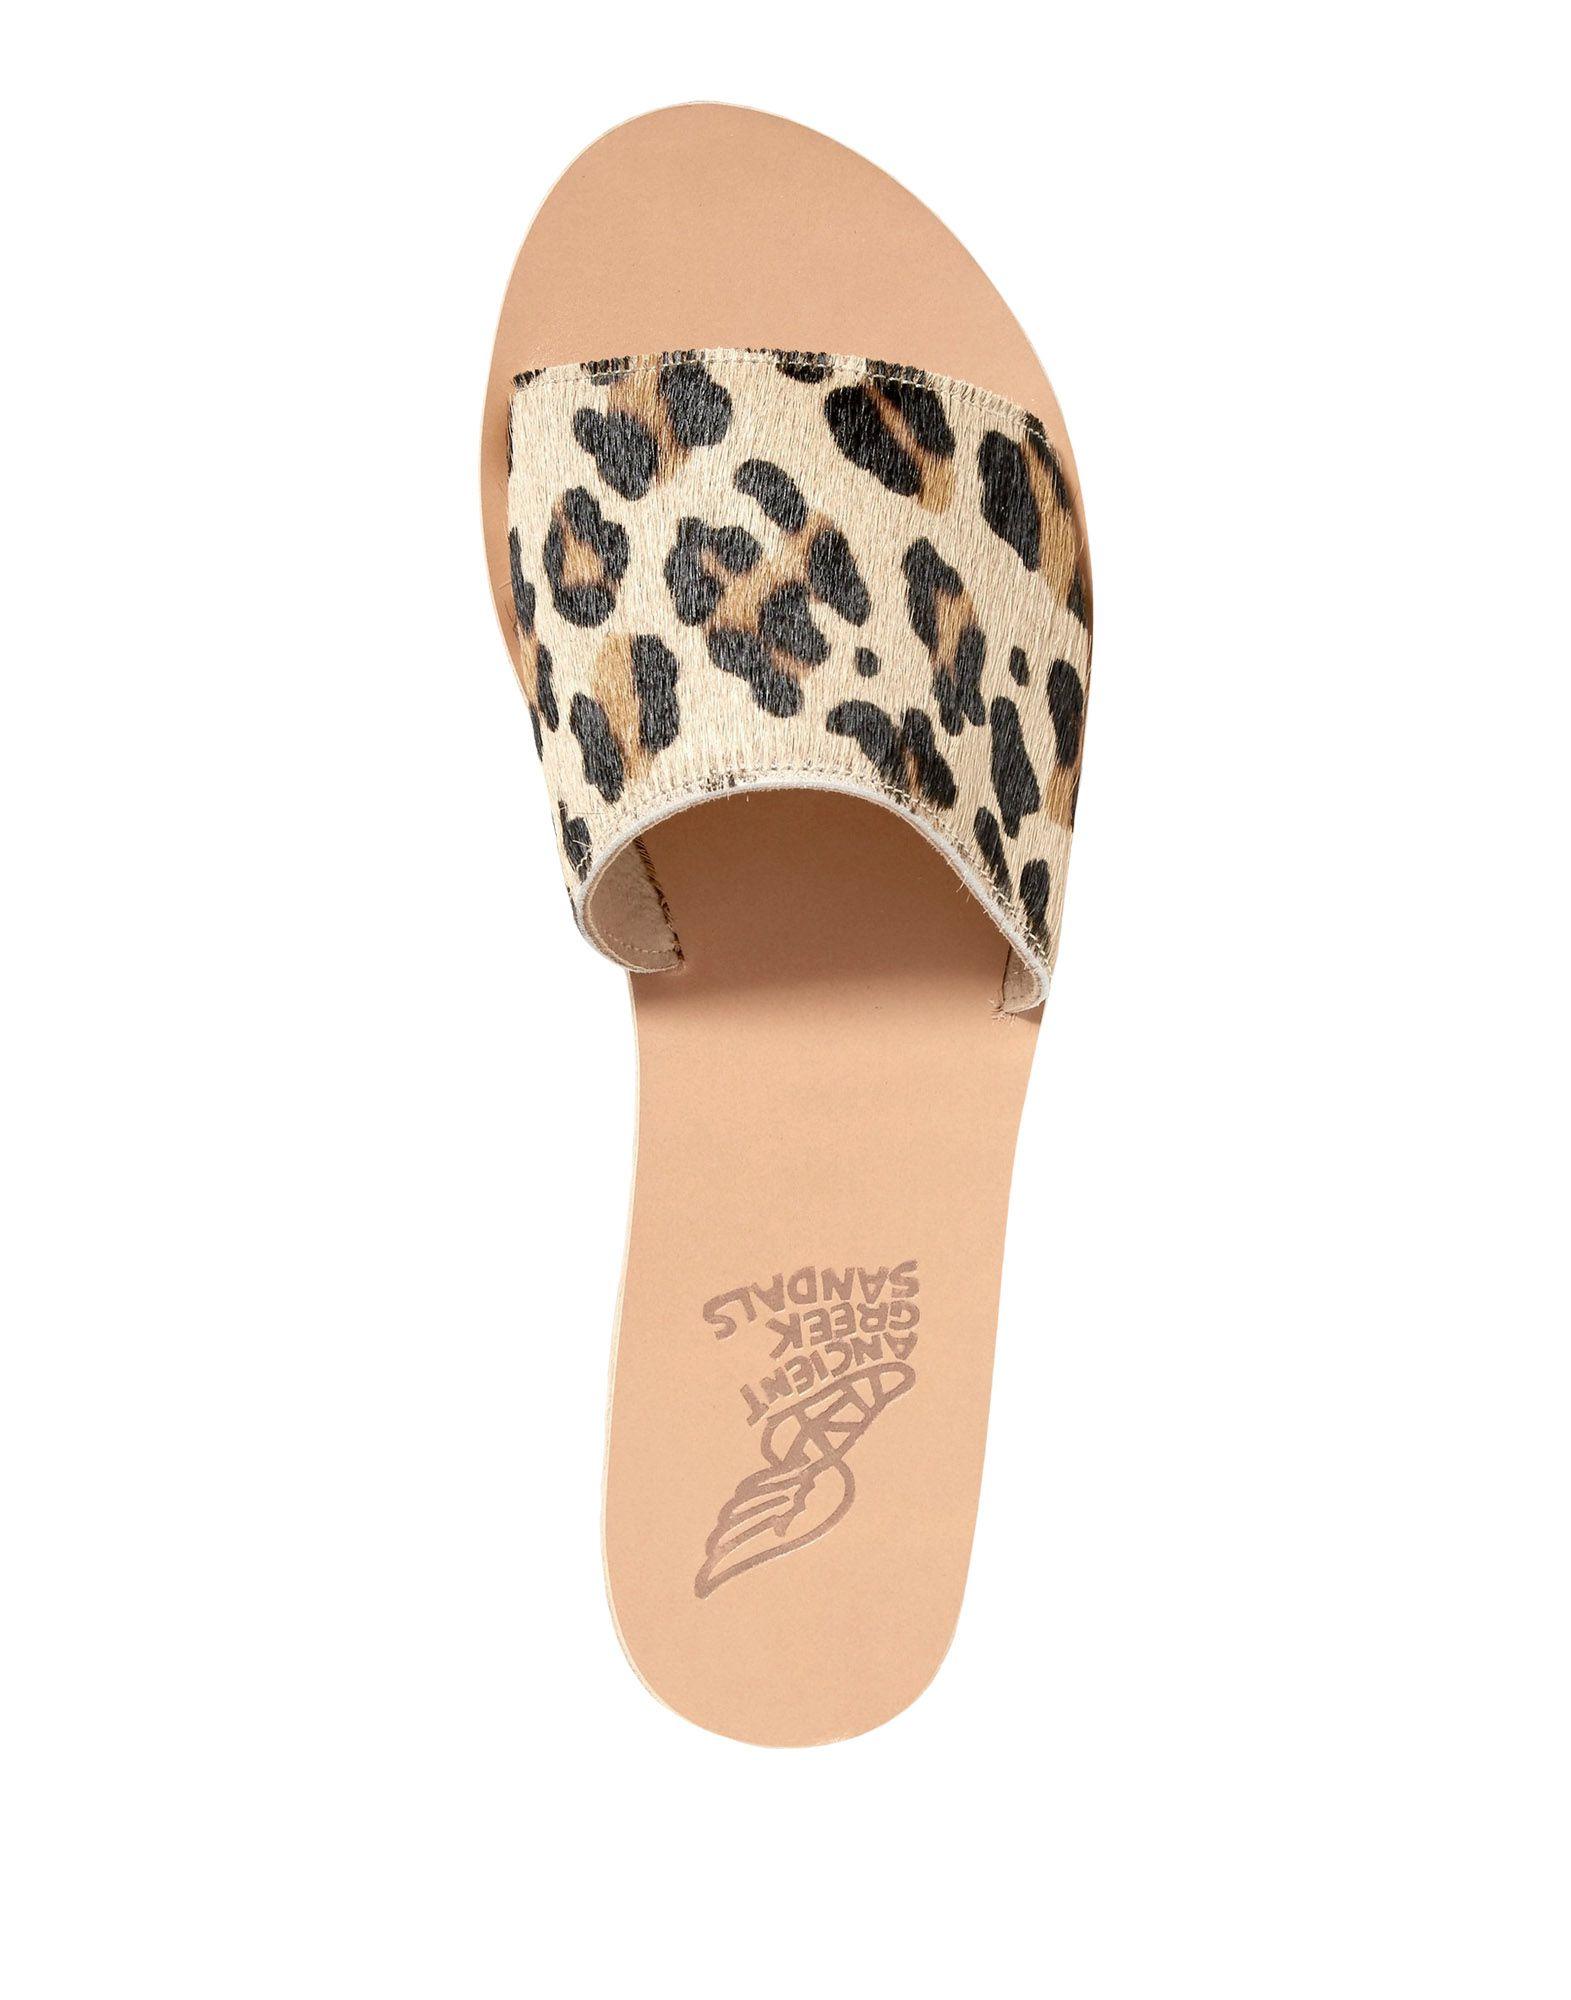 Sandali Ancient Ancient Ancient Greek Sandals Donna - 11532043PS b1738a